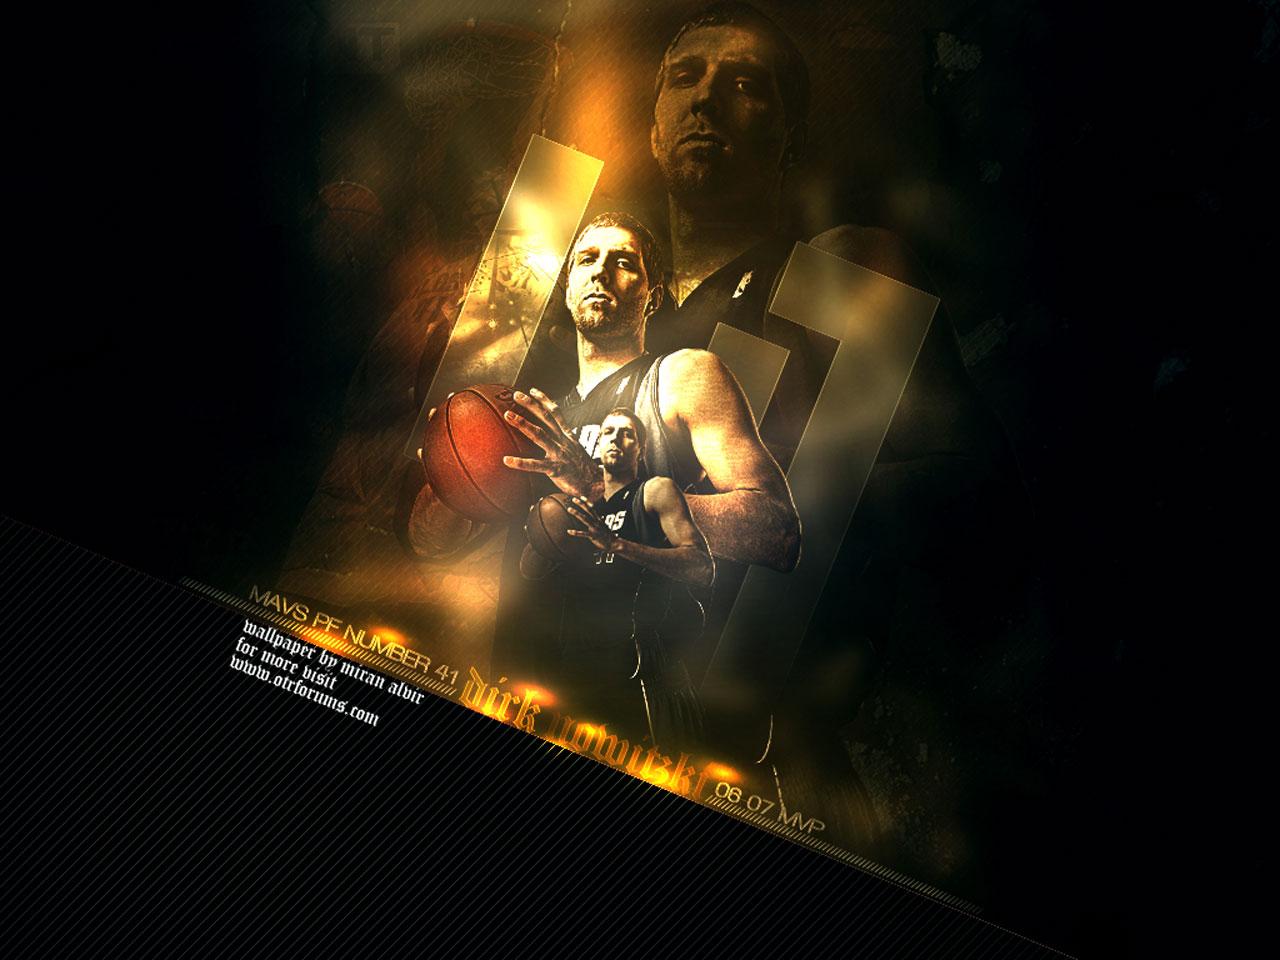 http://3.bp.blogspot.com/-RpKrr9SWv3M/TcTGCkJNrEI/AAAAAAAAOAc/Gik3RuA3vCM/s1600/Dirk-Nowitzki-Mavs-Wallpaper.jpg